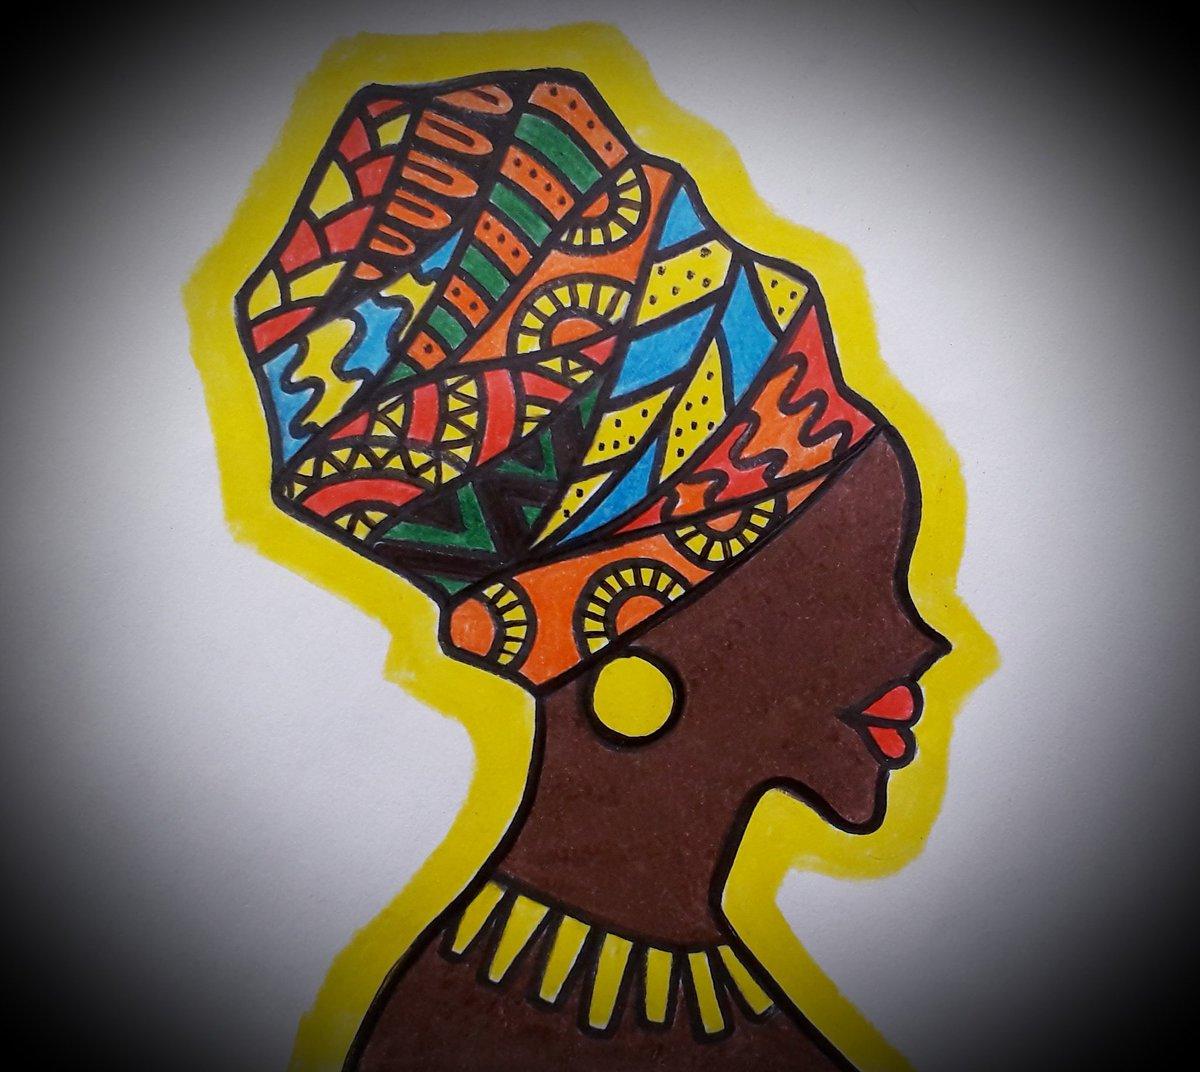 Negras #Desenho #Drawingpic.twitter.com/wdyLcbcuxU